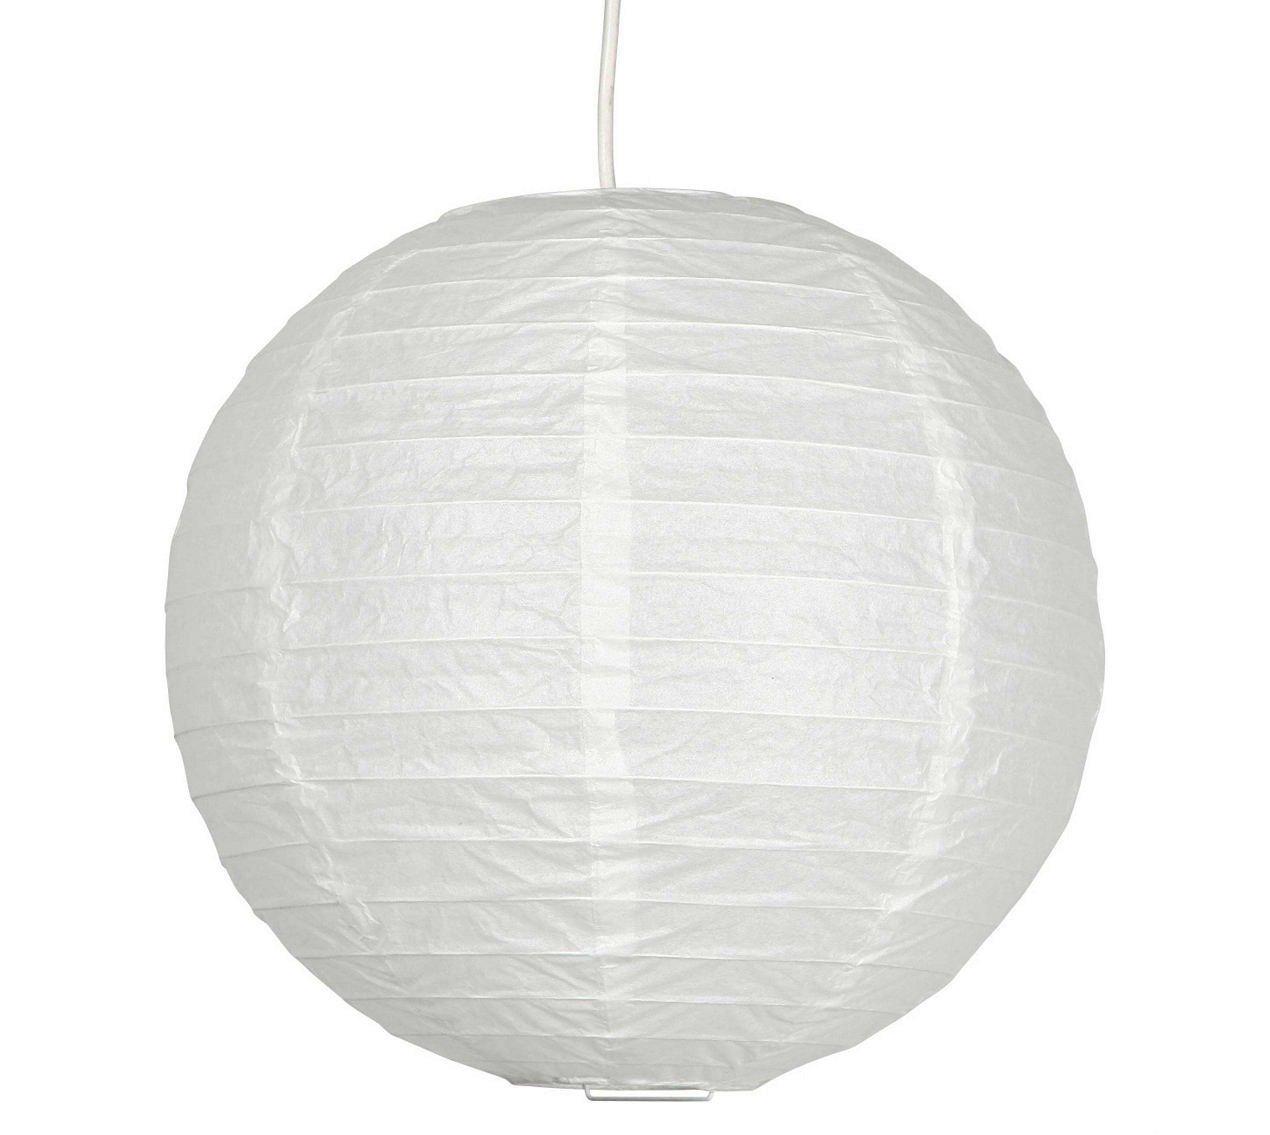 suspension boule asiatique. Black Bedroom Furniture Sets. Home Design Ideas